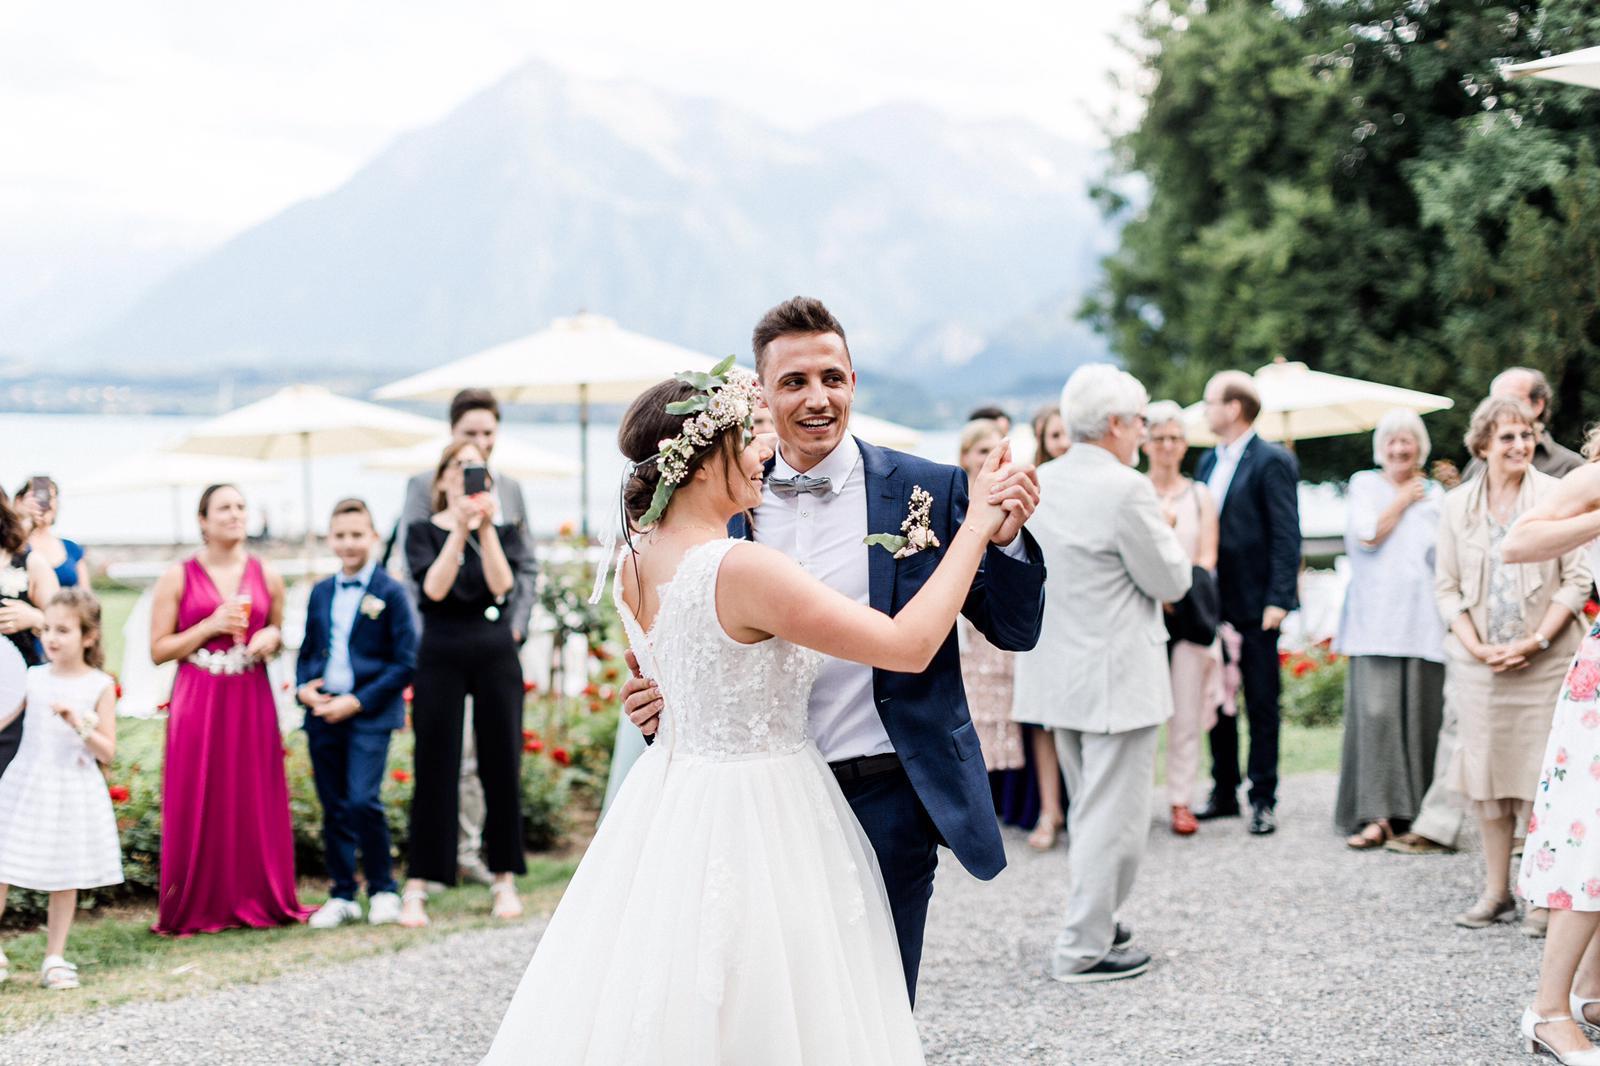 bride+bespoke+lace+wedding+dress+a+line+ccm.jpeg